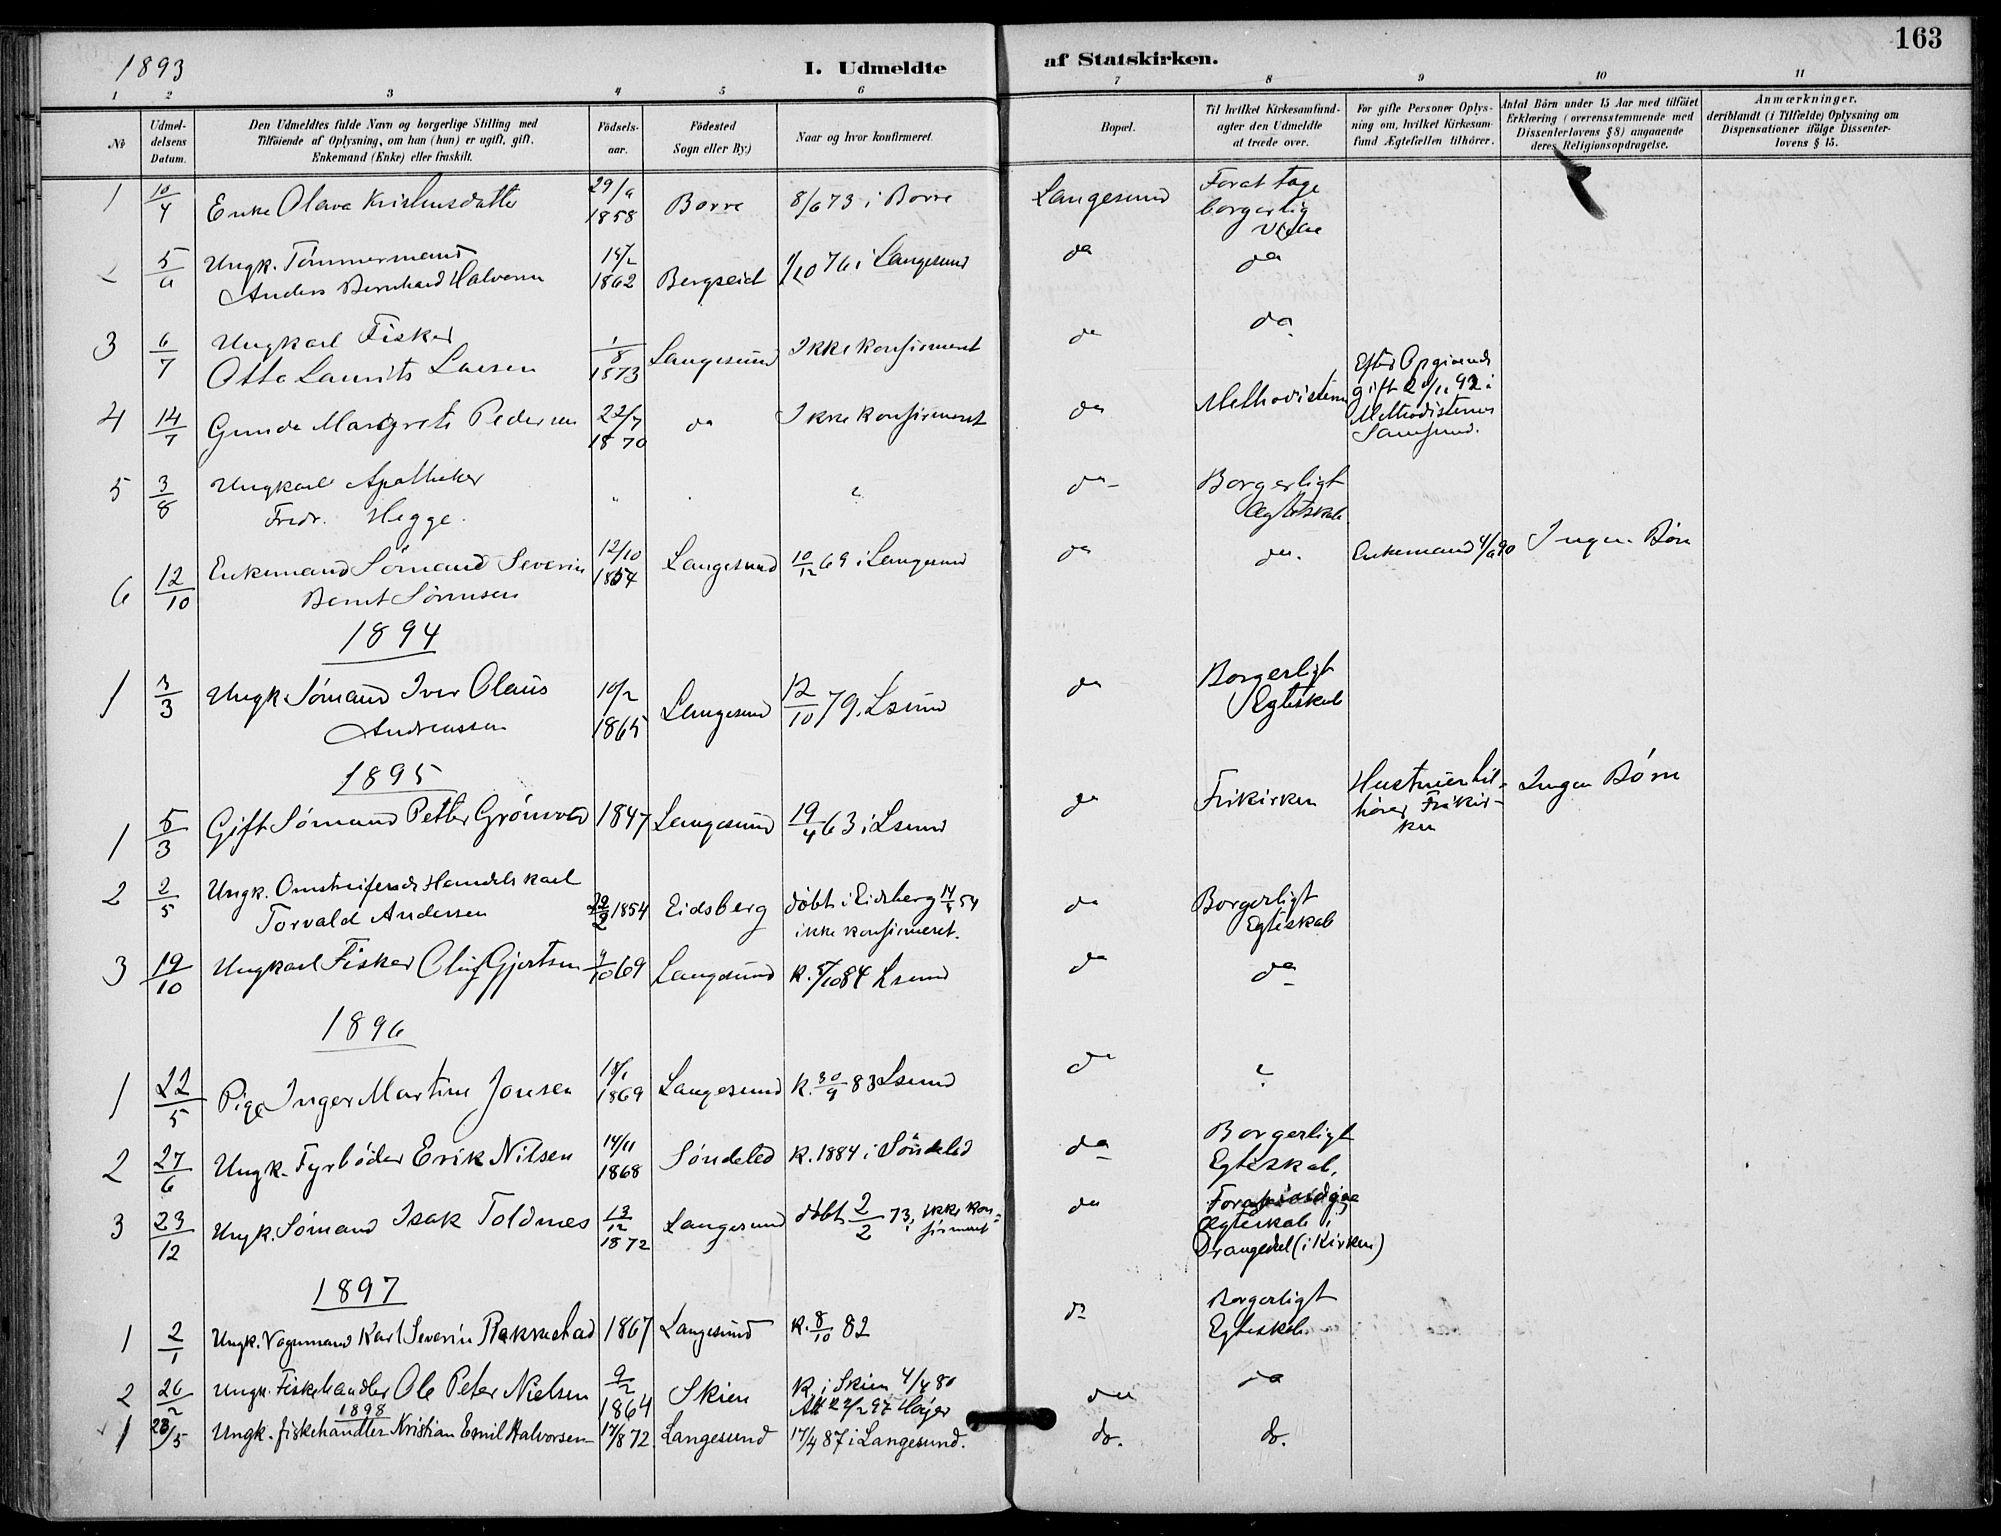 SAKO, Langesund kirkebøker, F/Fa/L0003: Ministerialbok nr. 3, 1893-1907, s. 163